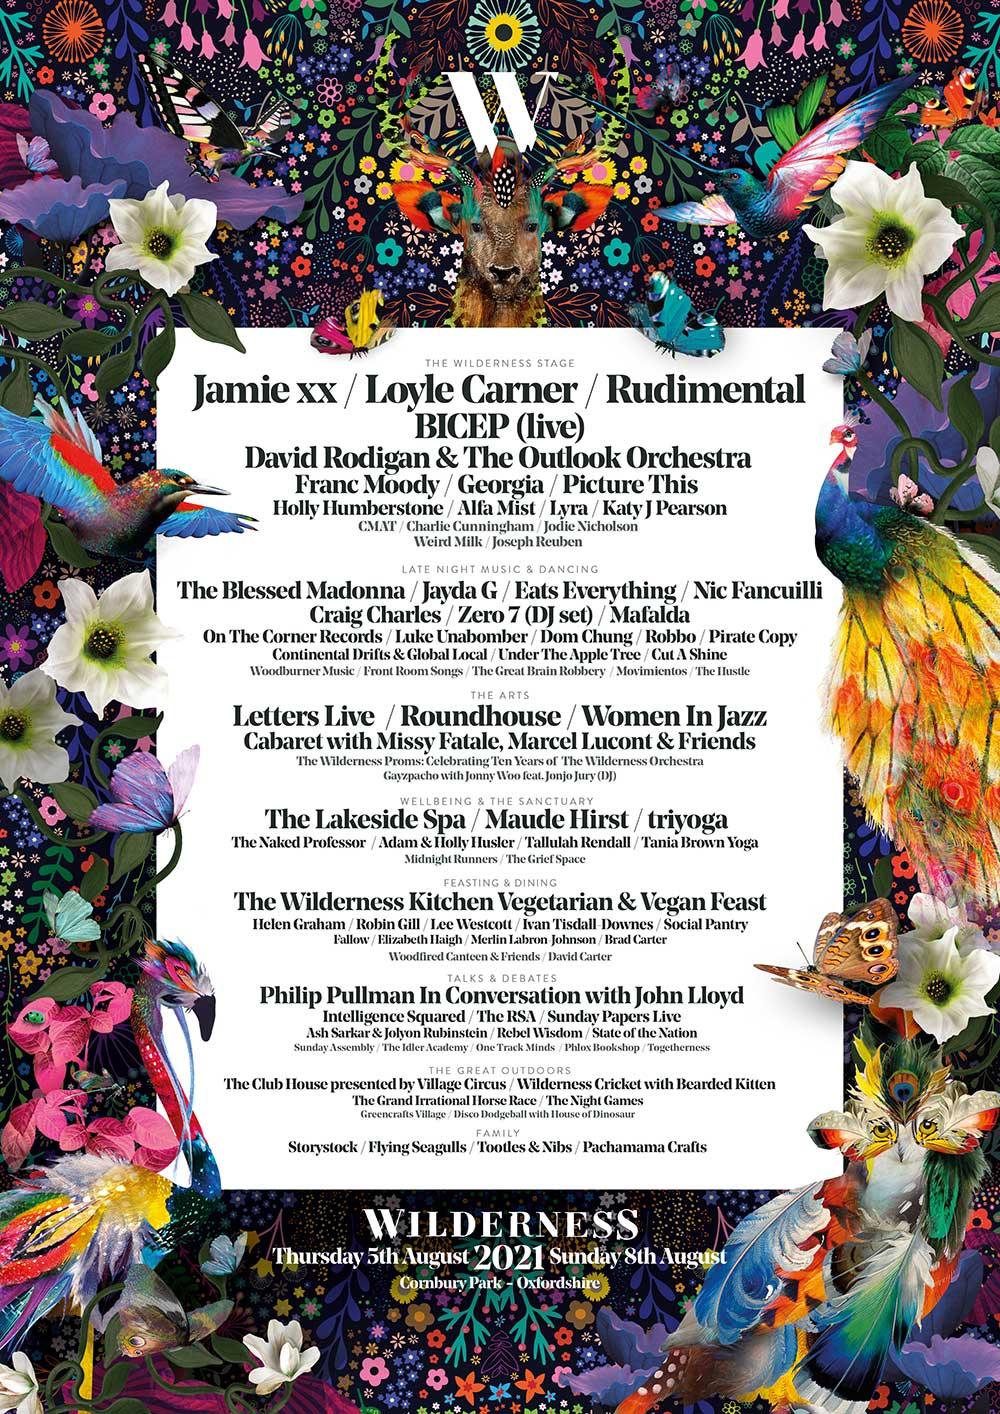 Wilderness Festival Line-up Poster 2021